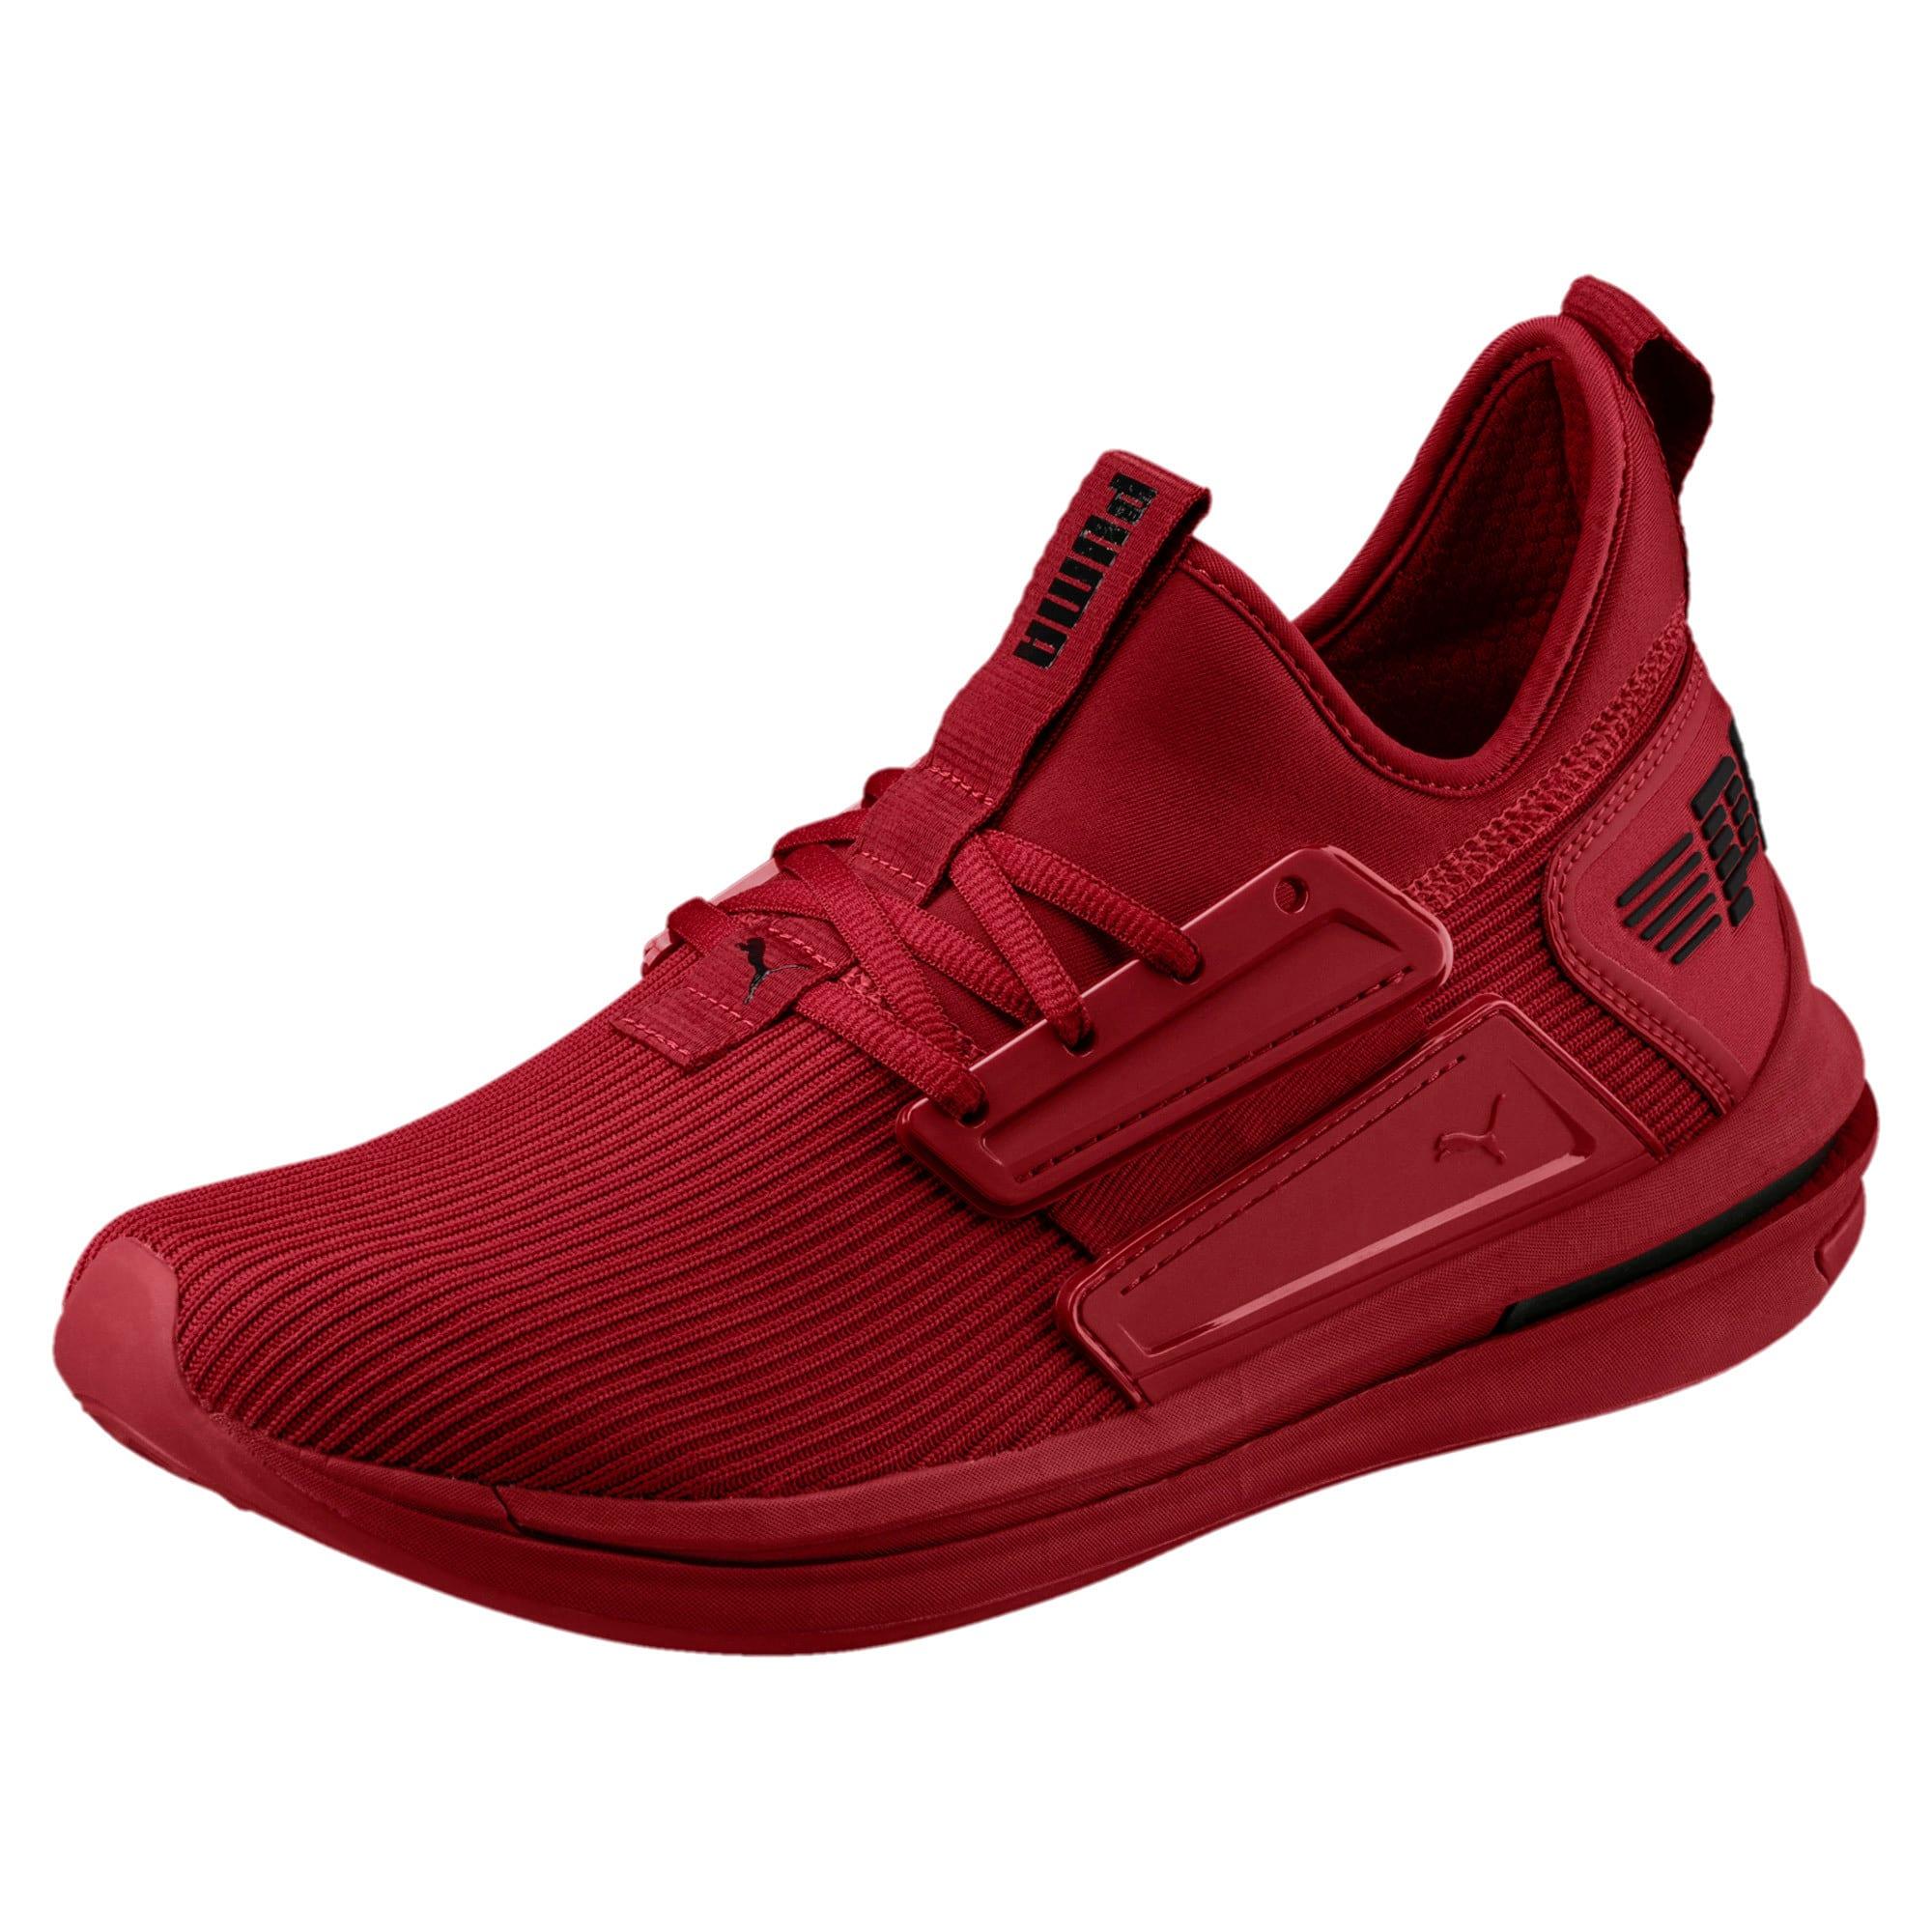 Thumbnail 1 of IGNITE Limitless SR Men's Running Shoes, Red Dahlia, medium